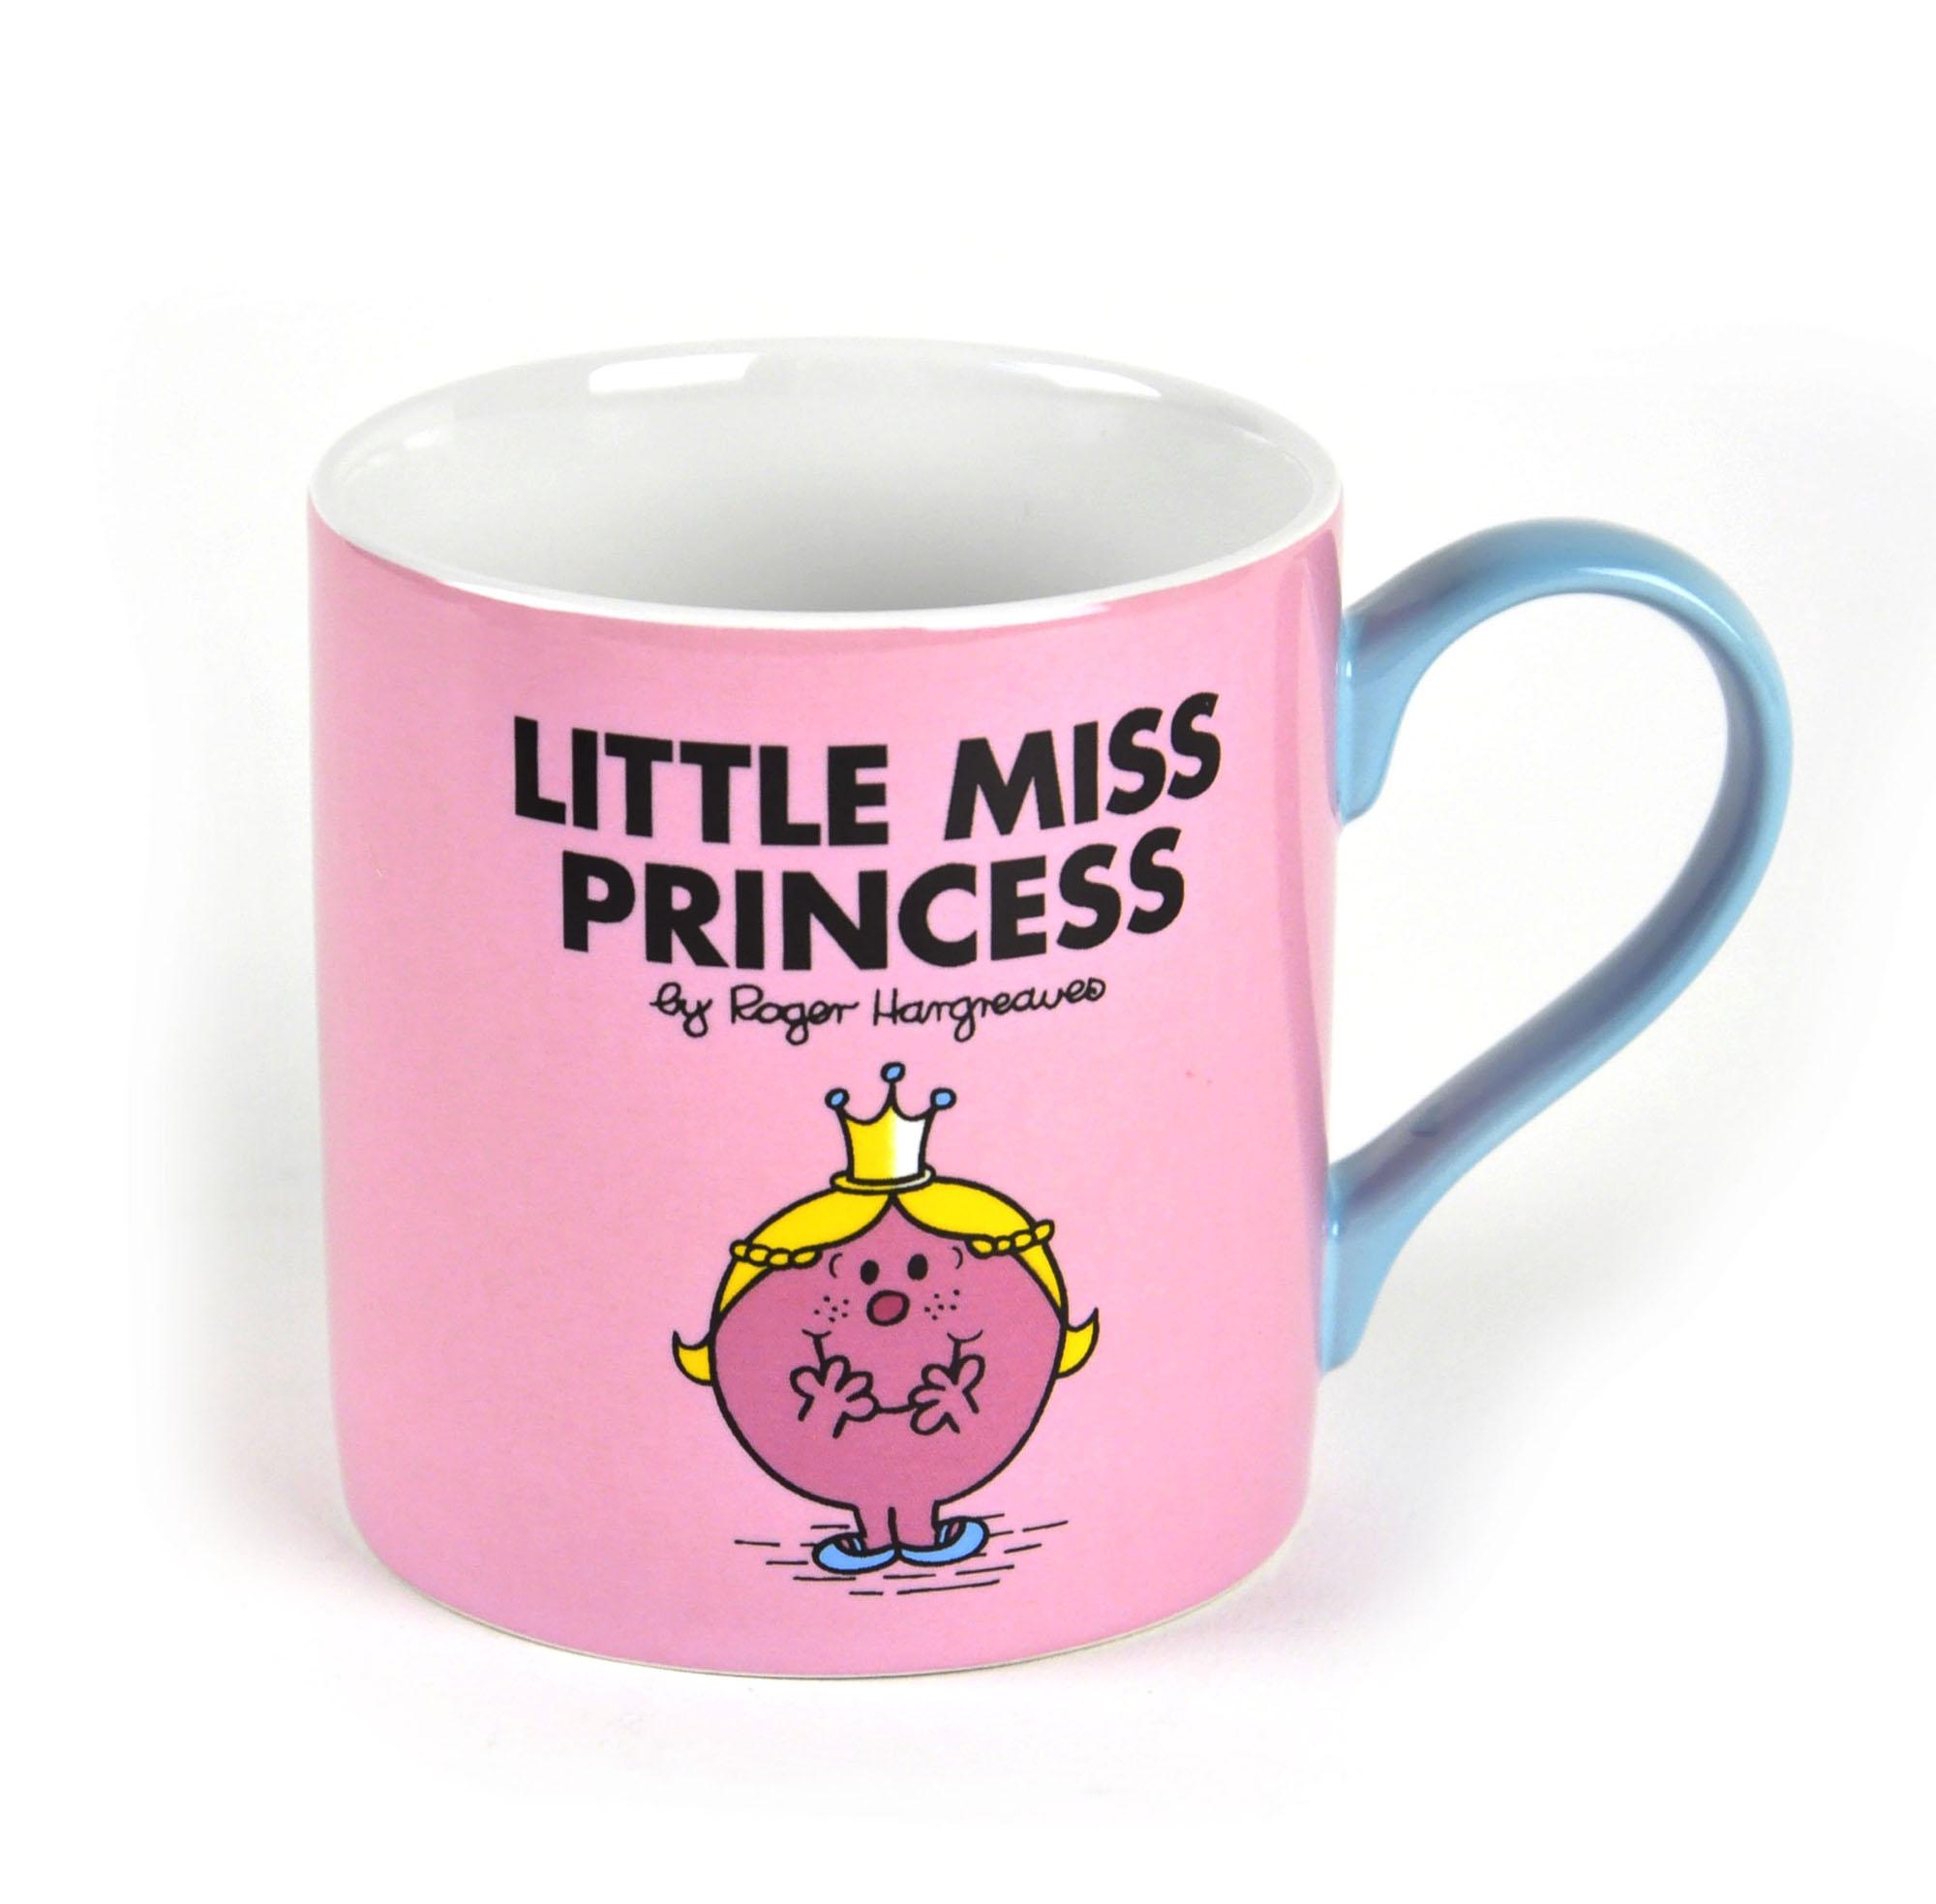 Best Coffee Mugs Little Miss Princess Full Colour Mr Men And Little Miss